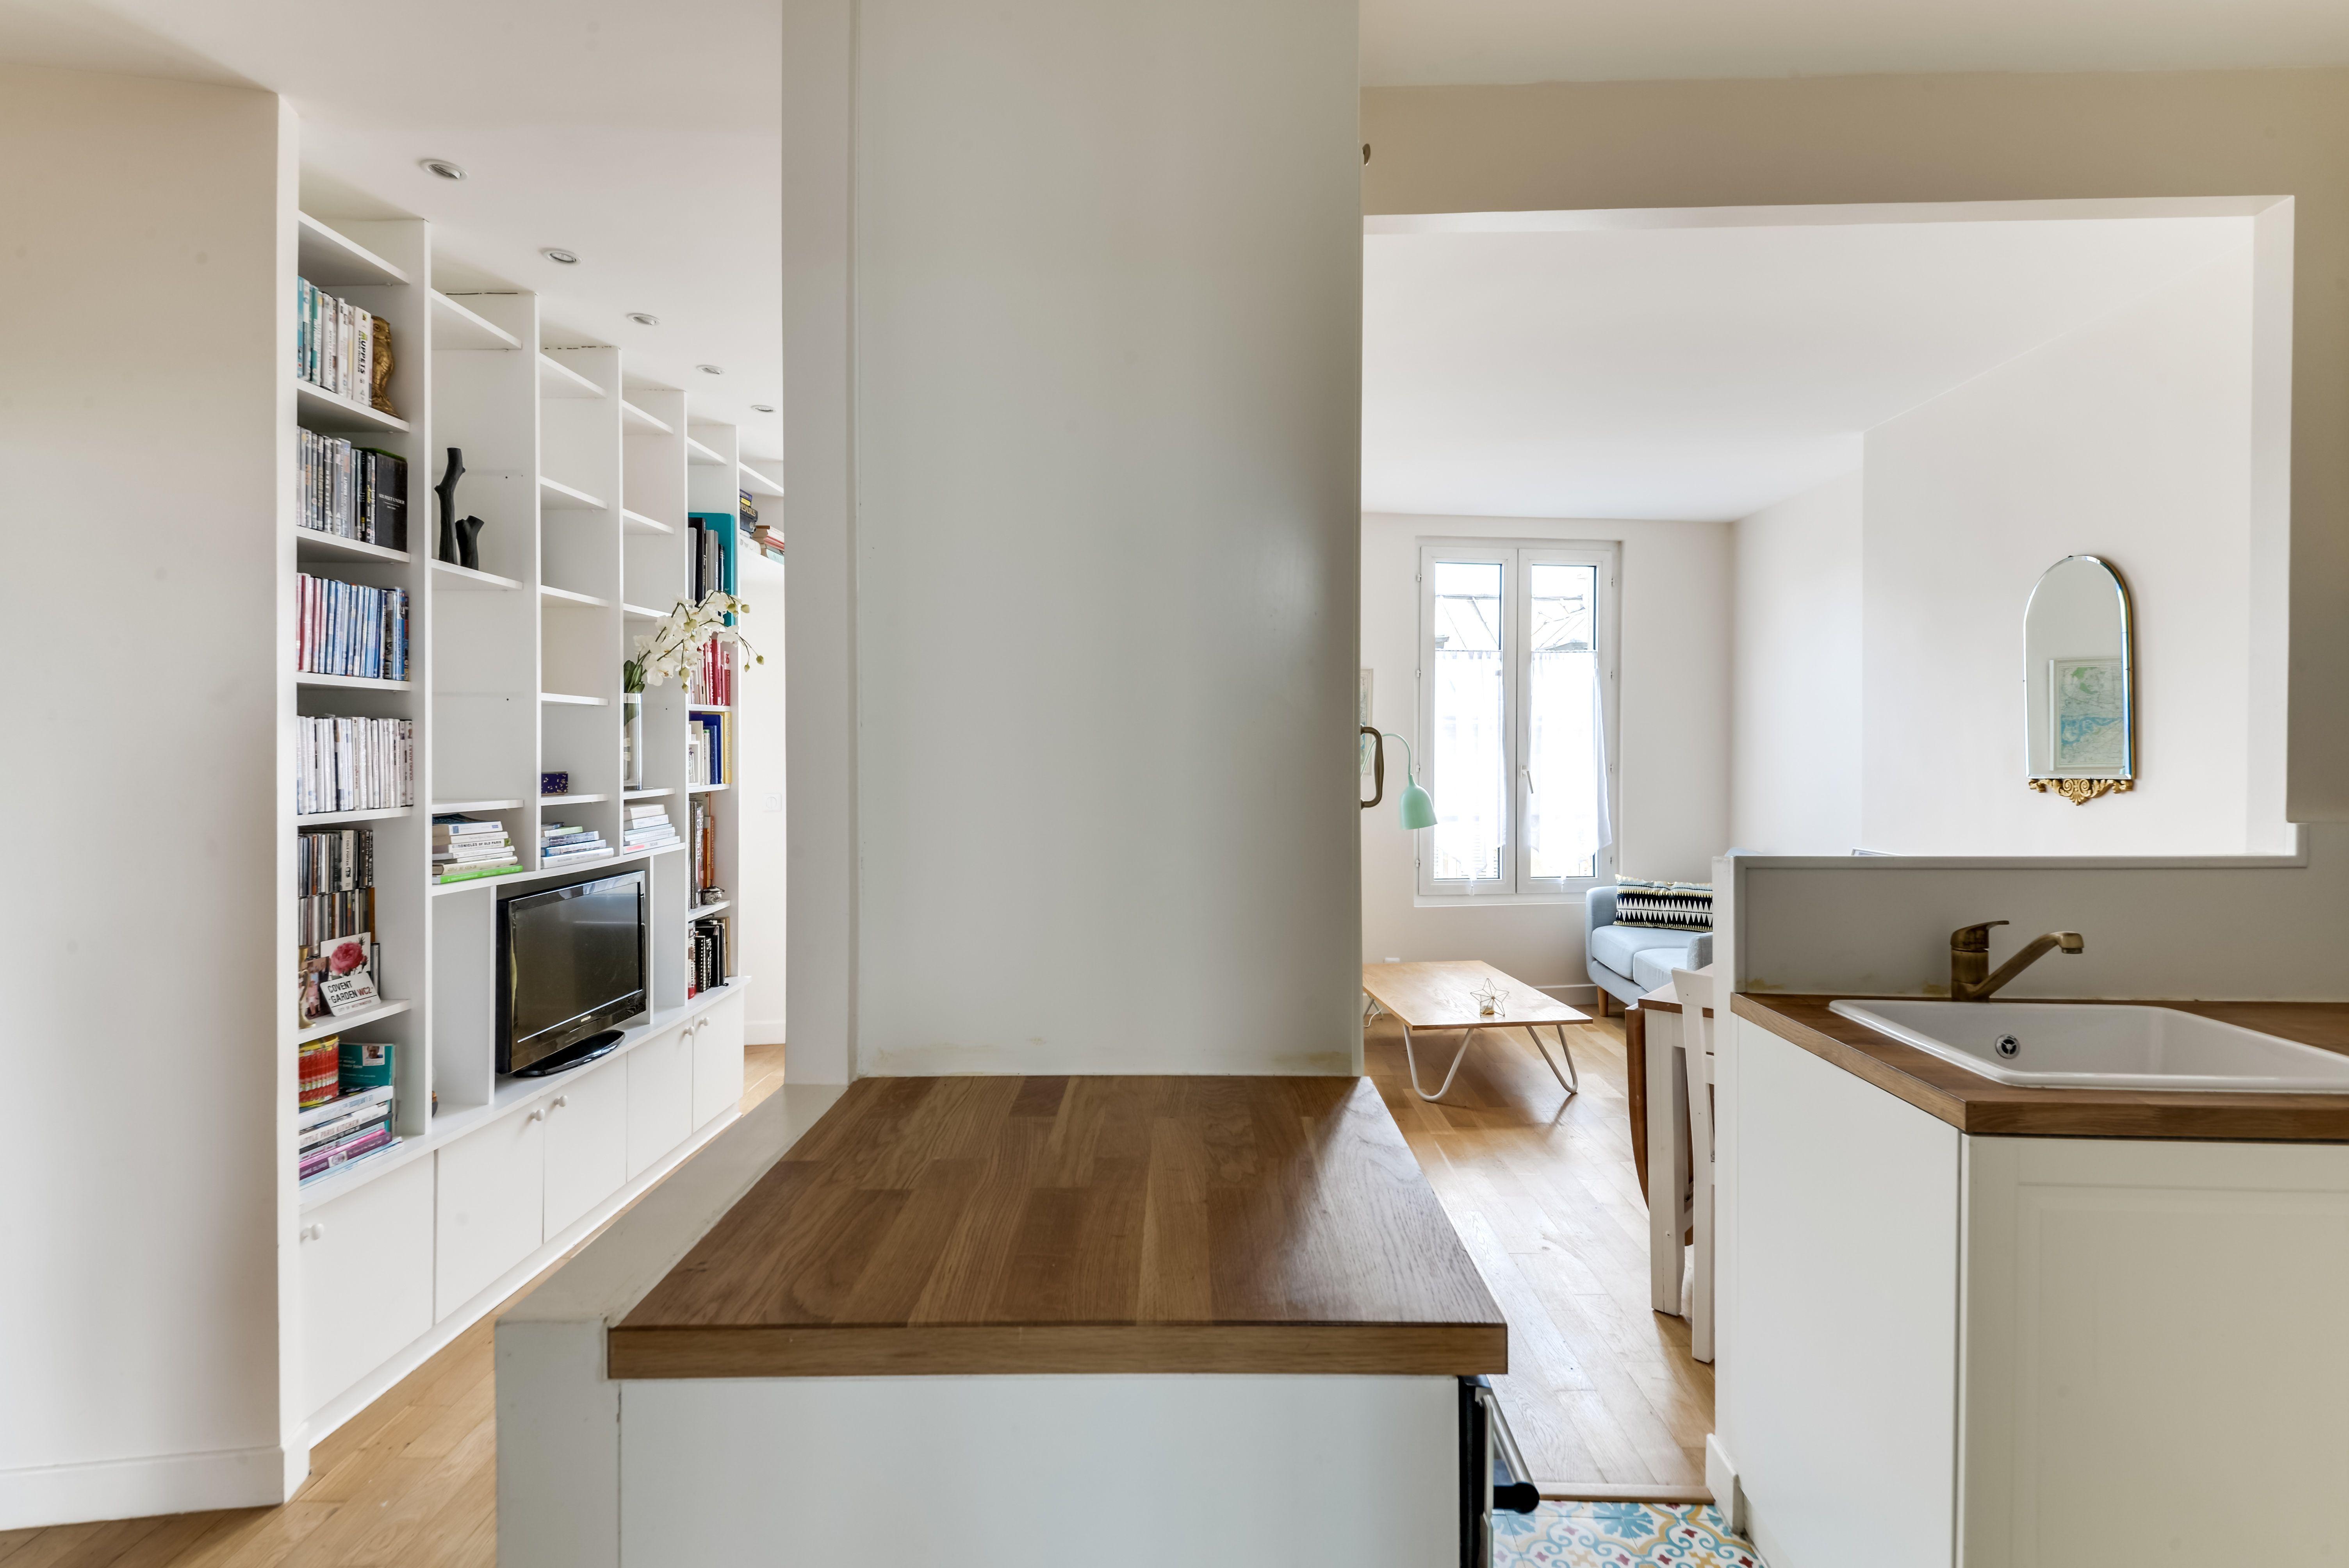 cuisine versailles nicolas corazzari global design pinterest architecte interieur. Black Bedroom Furniture Sets. Home Design Ideas